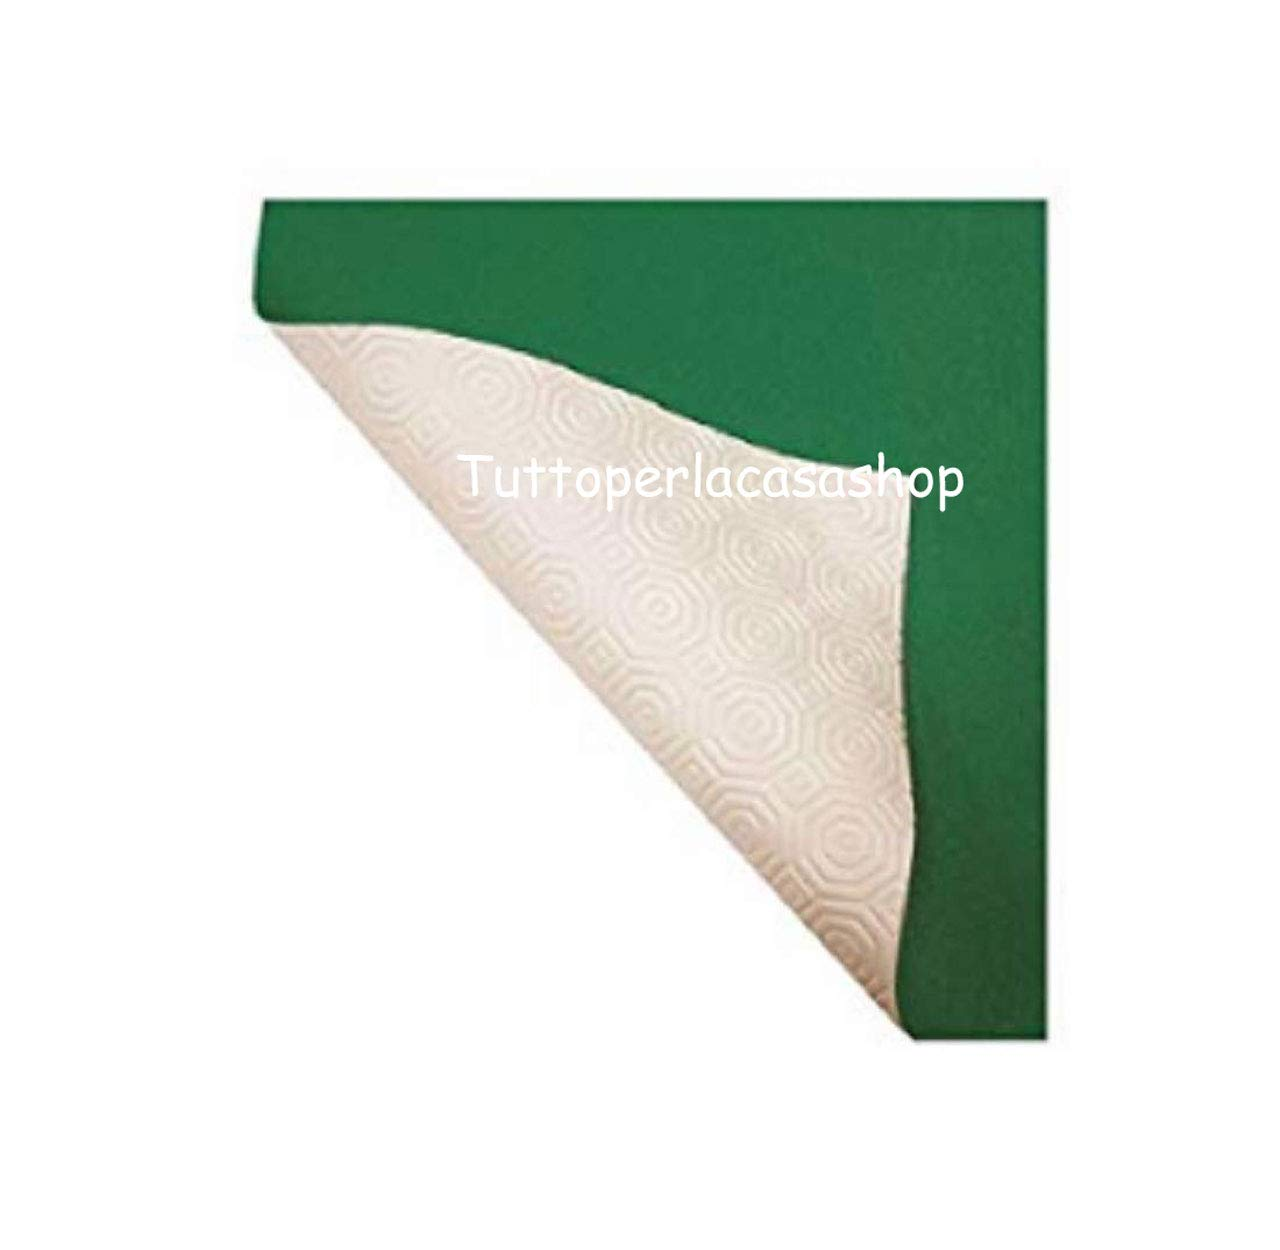 muletón verde blanco - Mantel protector de mesa goma Alt. cm 140 ...